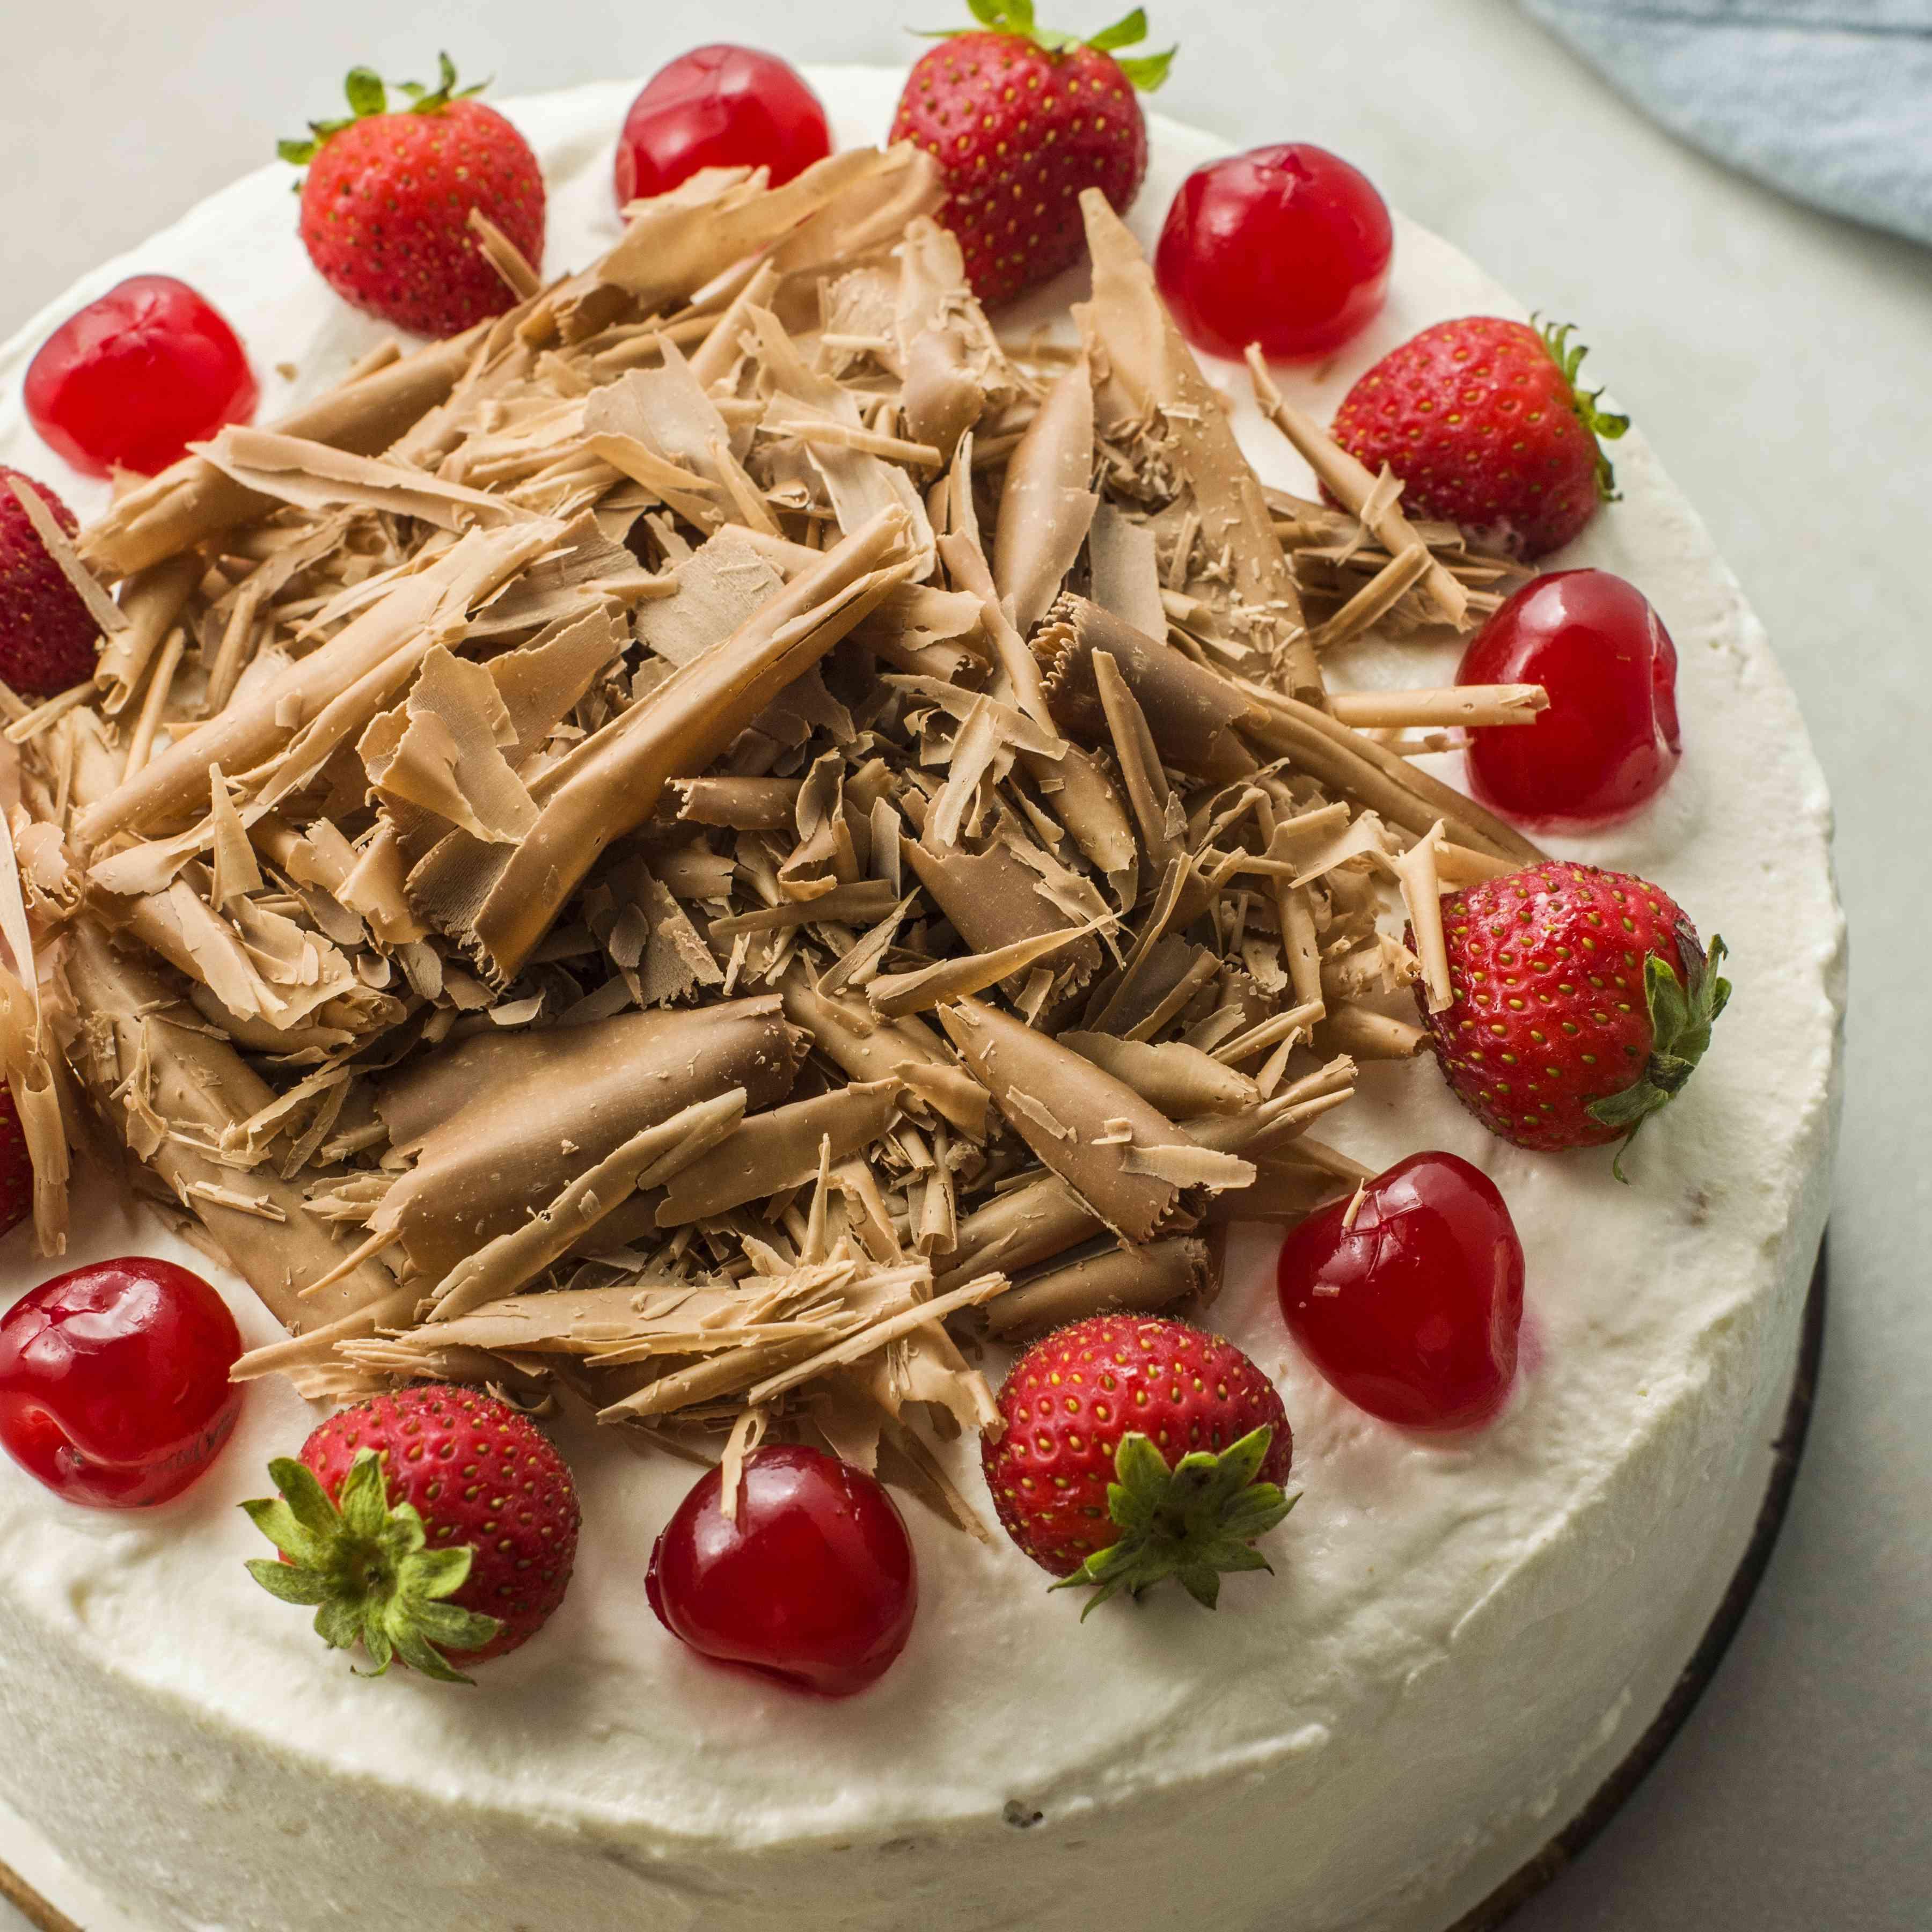 Italian ricotta cassata cake fully decorated